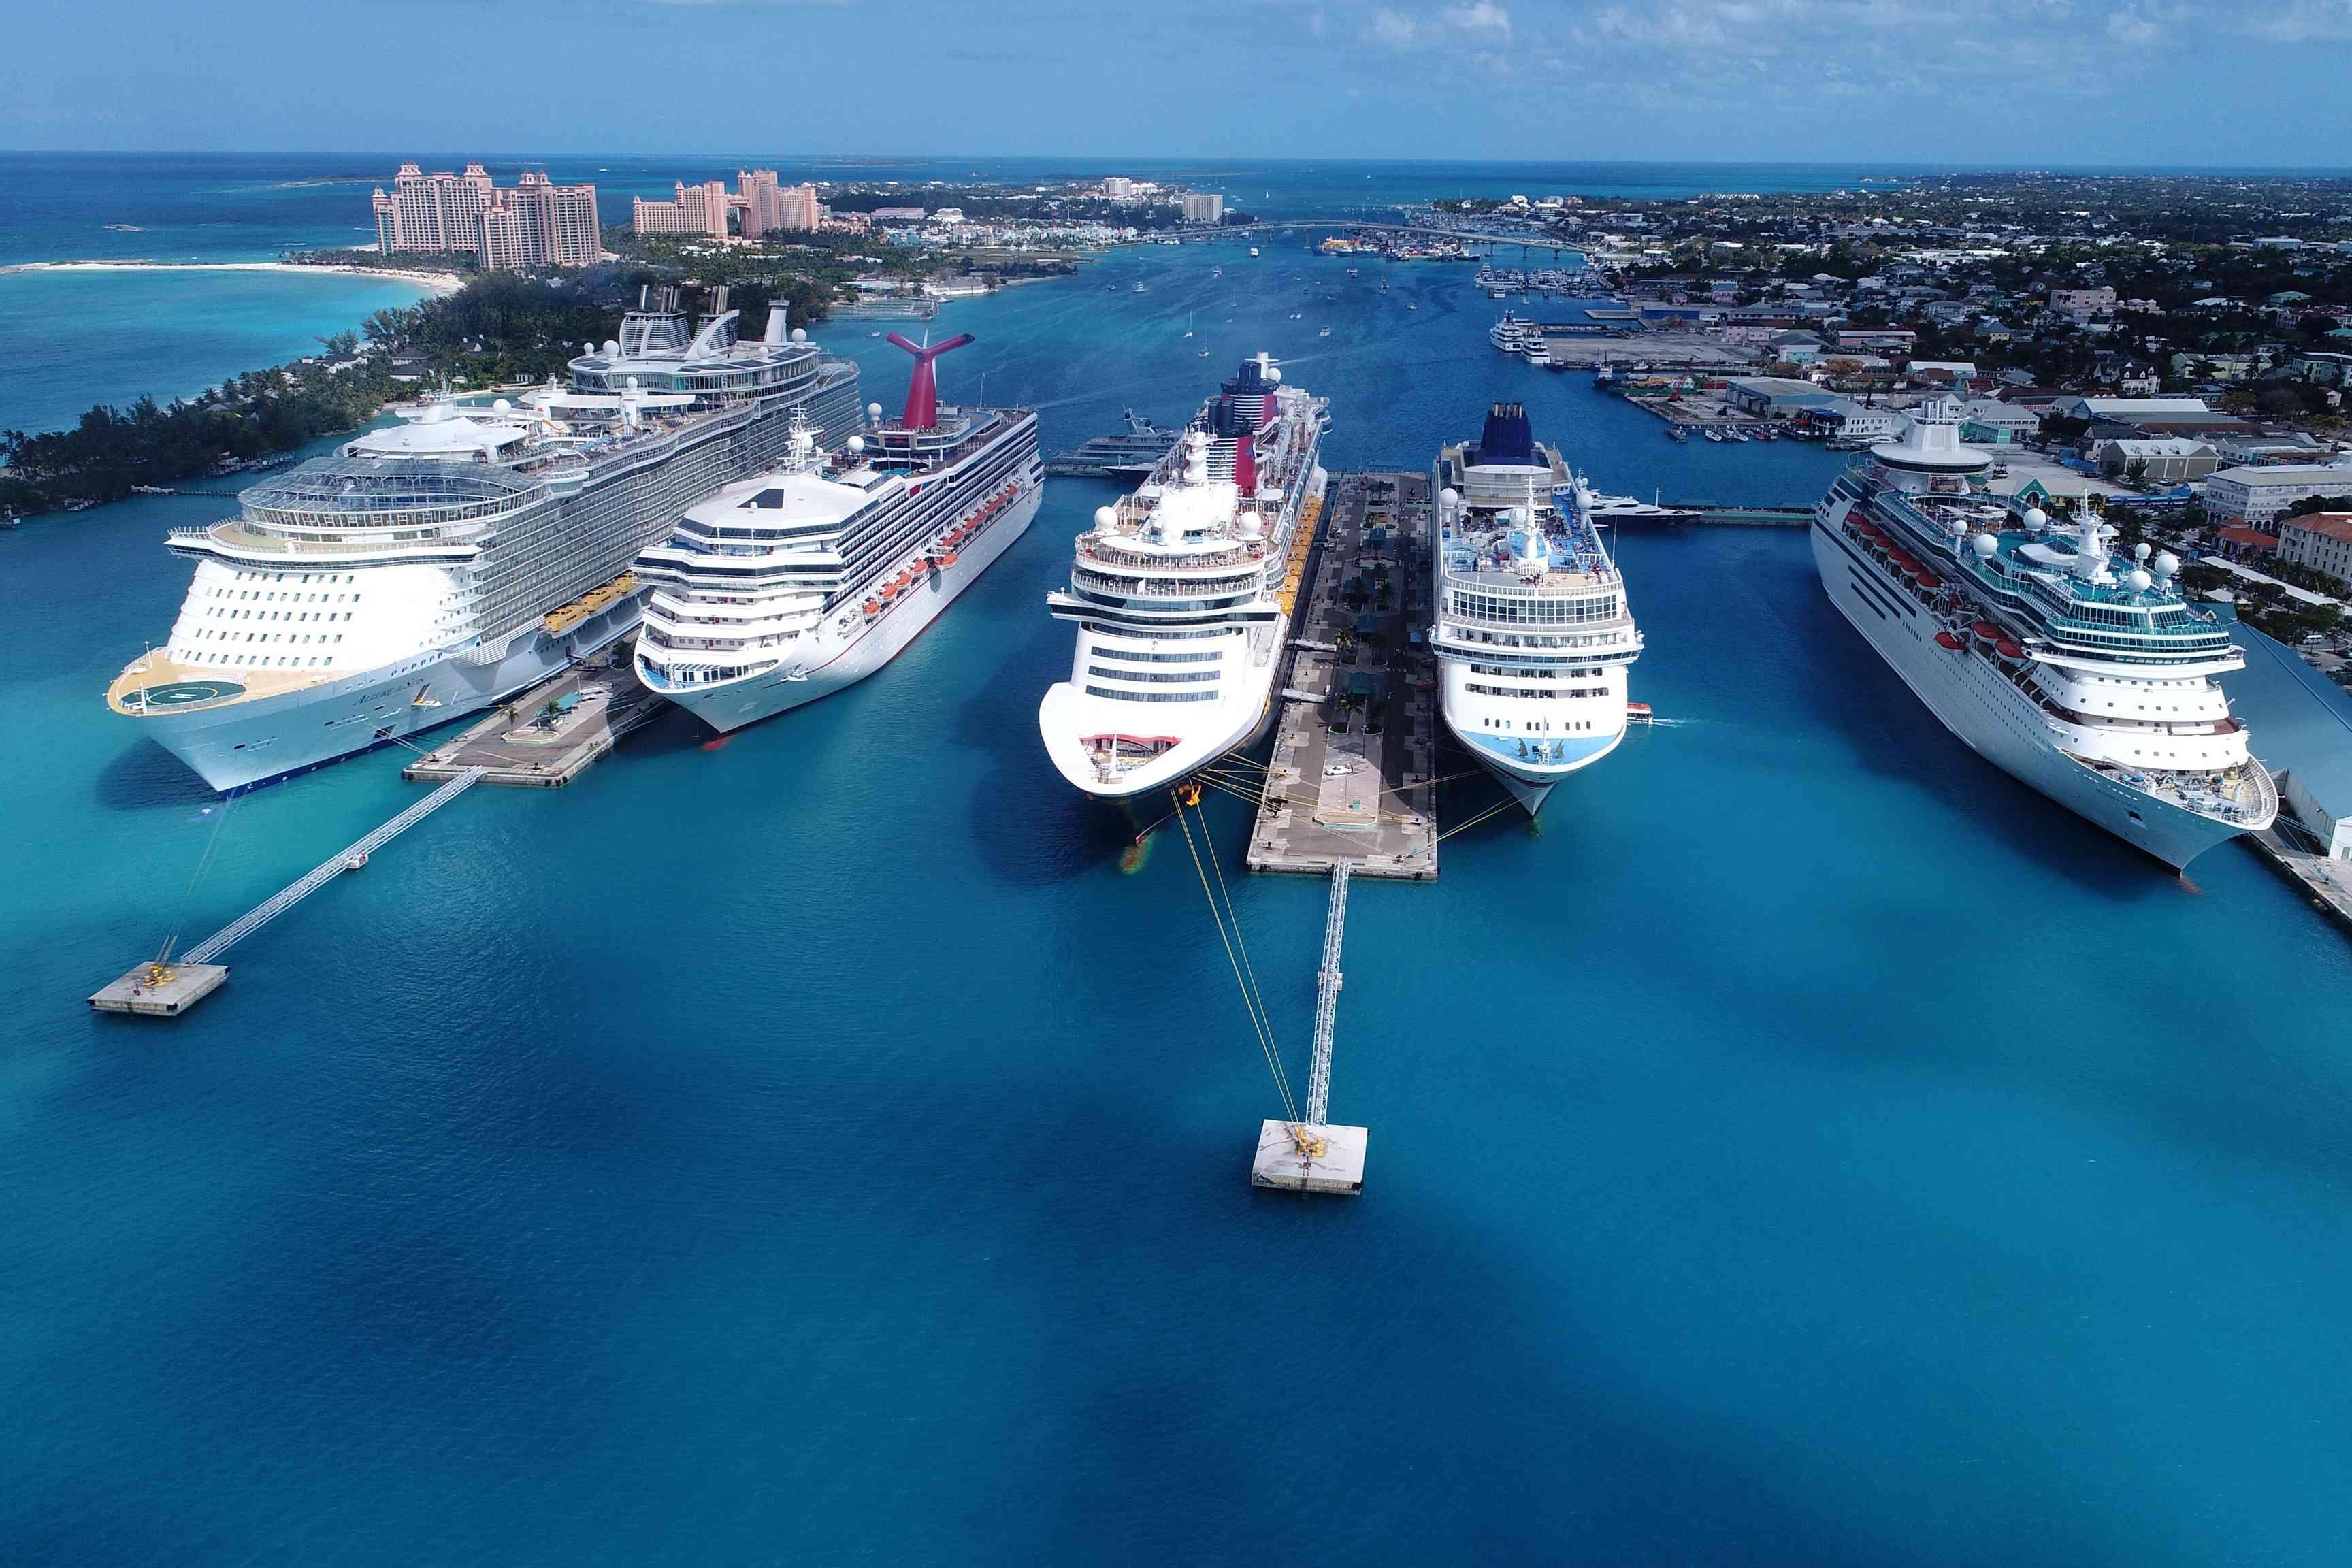 Cruise ships moored in sea in Nassau, Bahamas